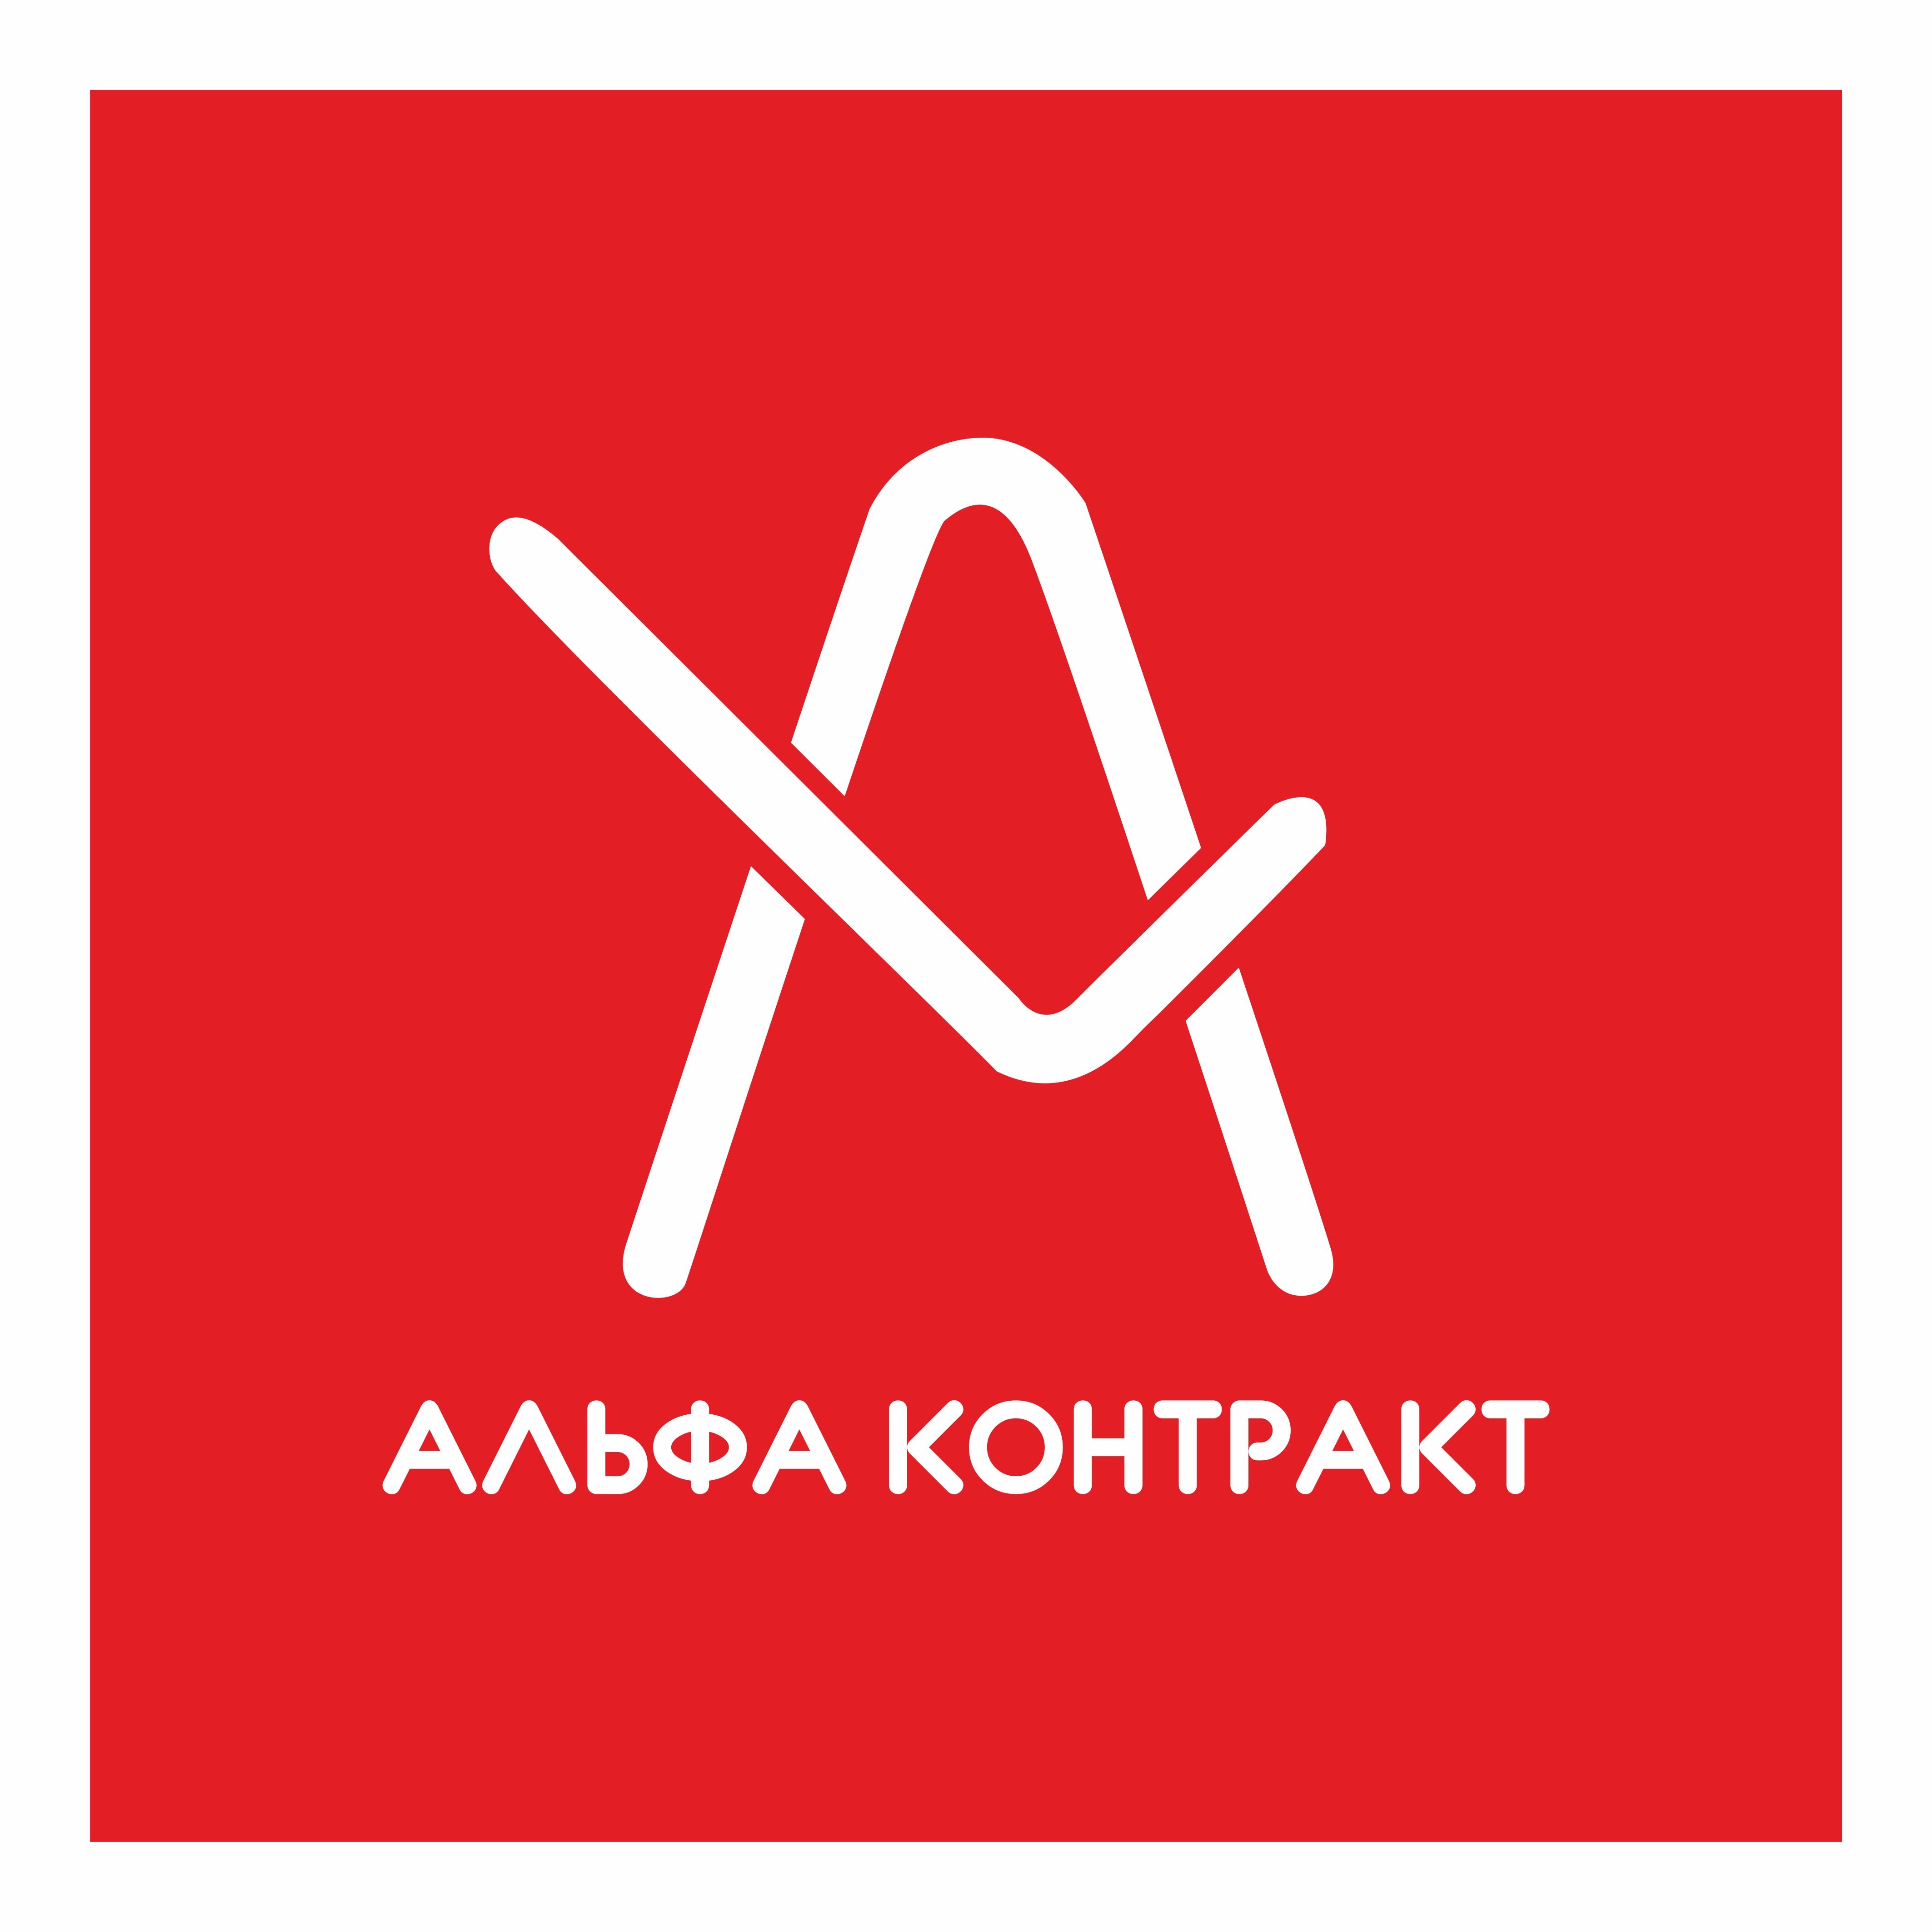 Дизайнер для разработки логотипа компании фото f_9345bfafb27e3c02.jpg